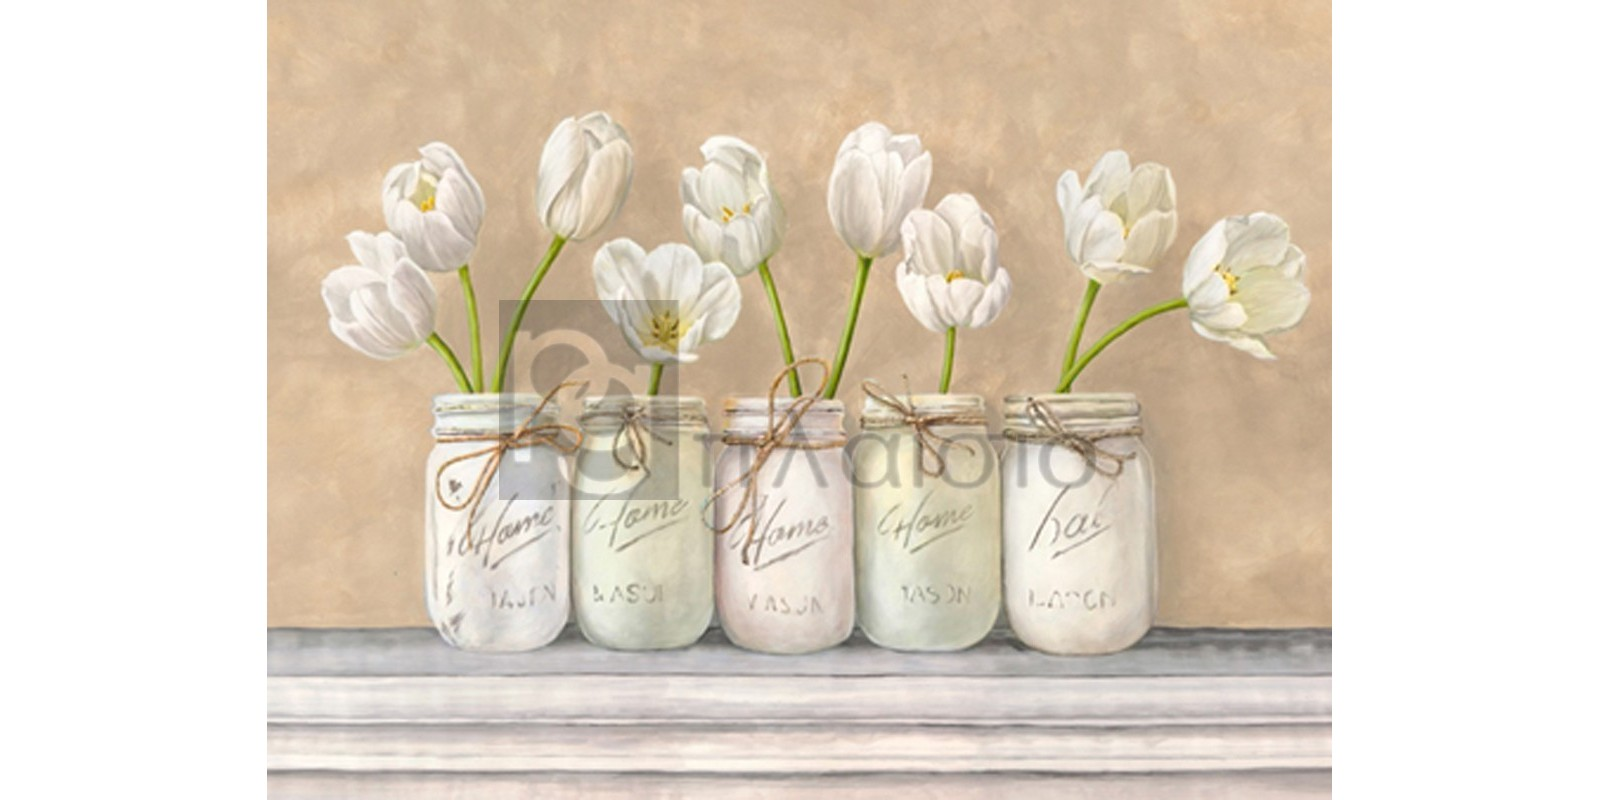 Jenny Thomlinson - White Tulips in Mason Jars